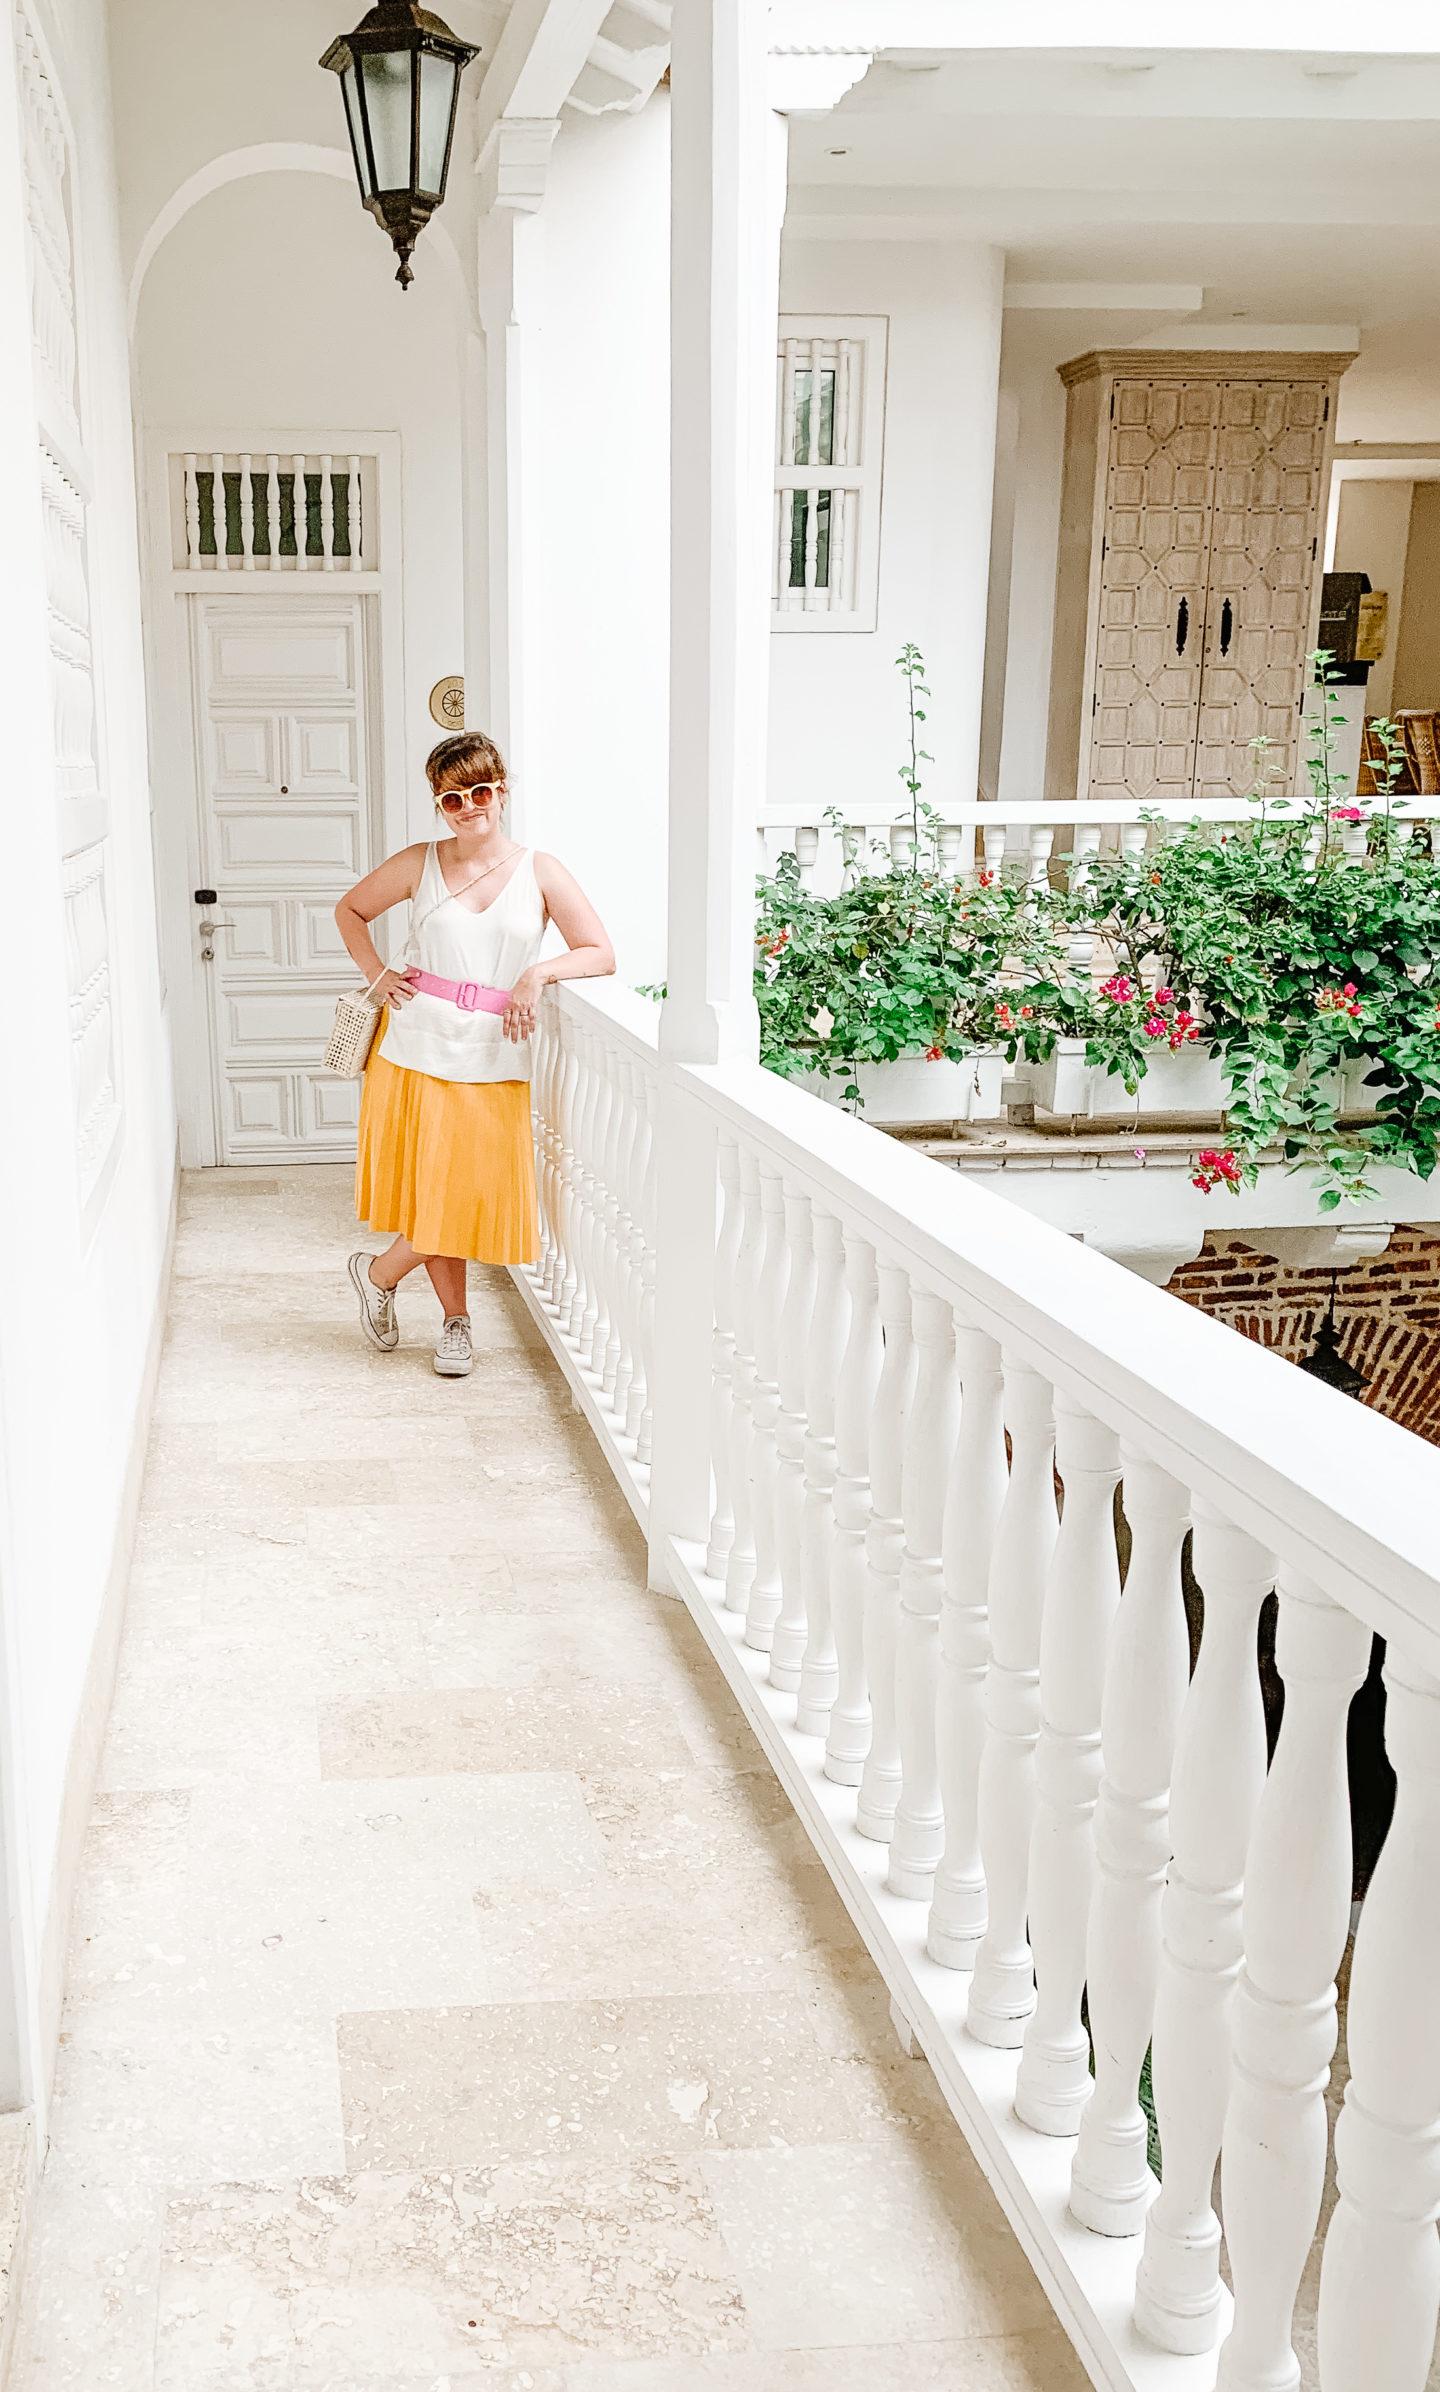 Casa cochera del gobernador, Cartagena